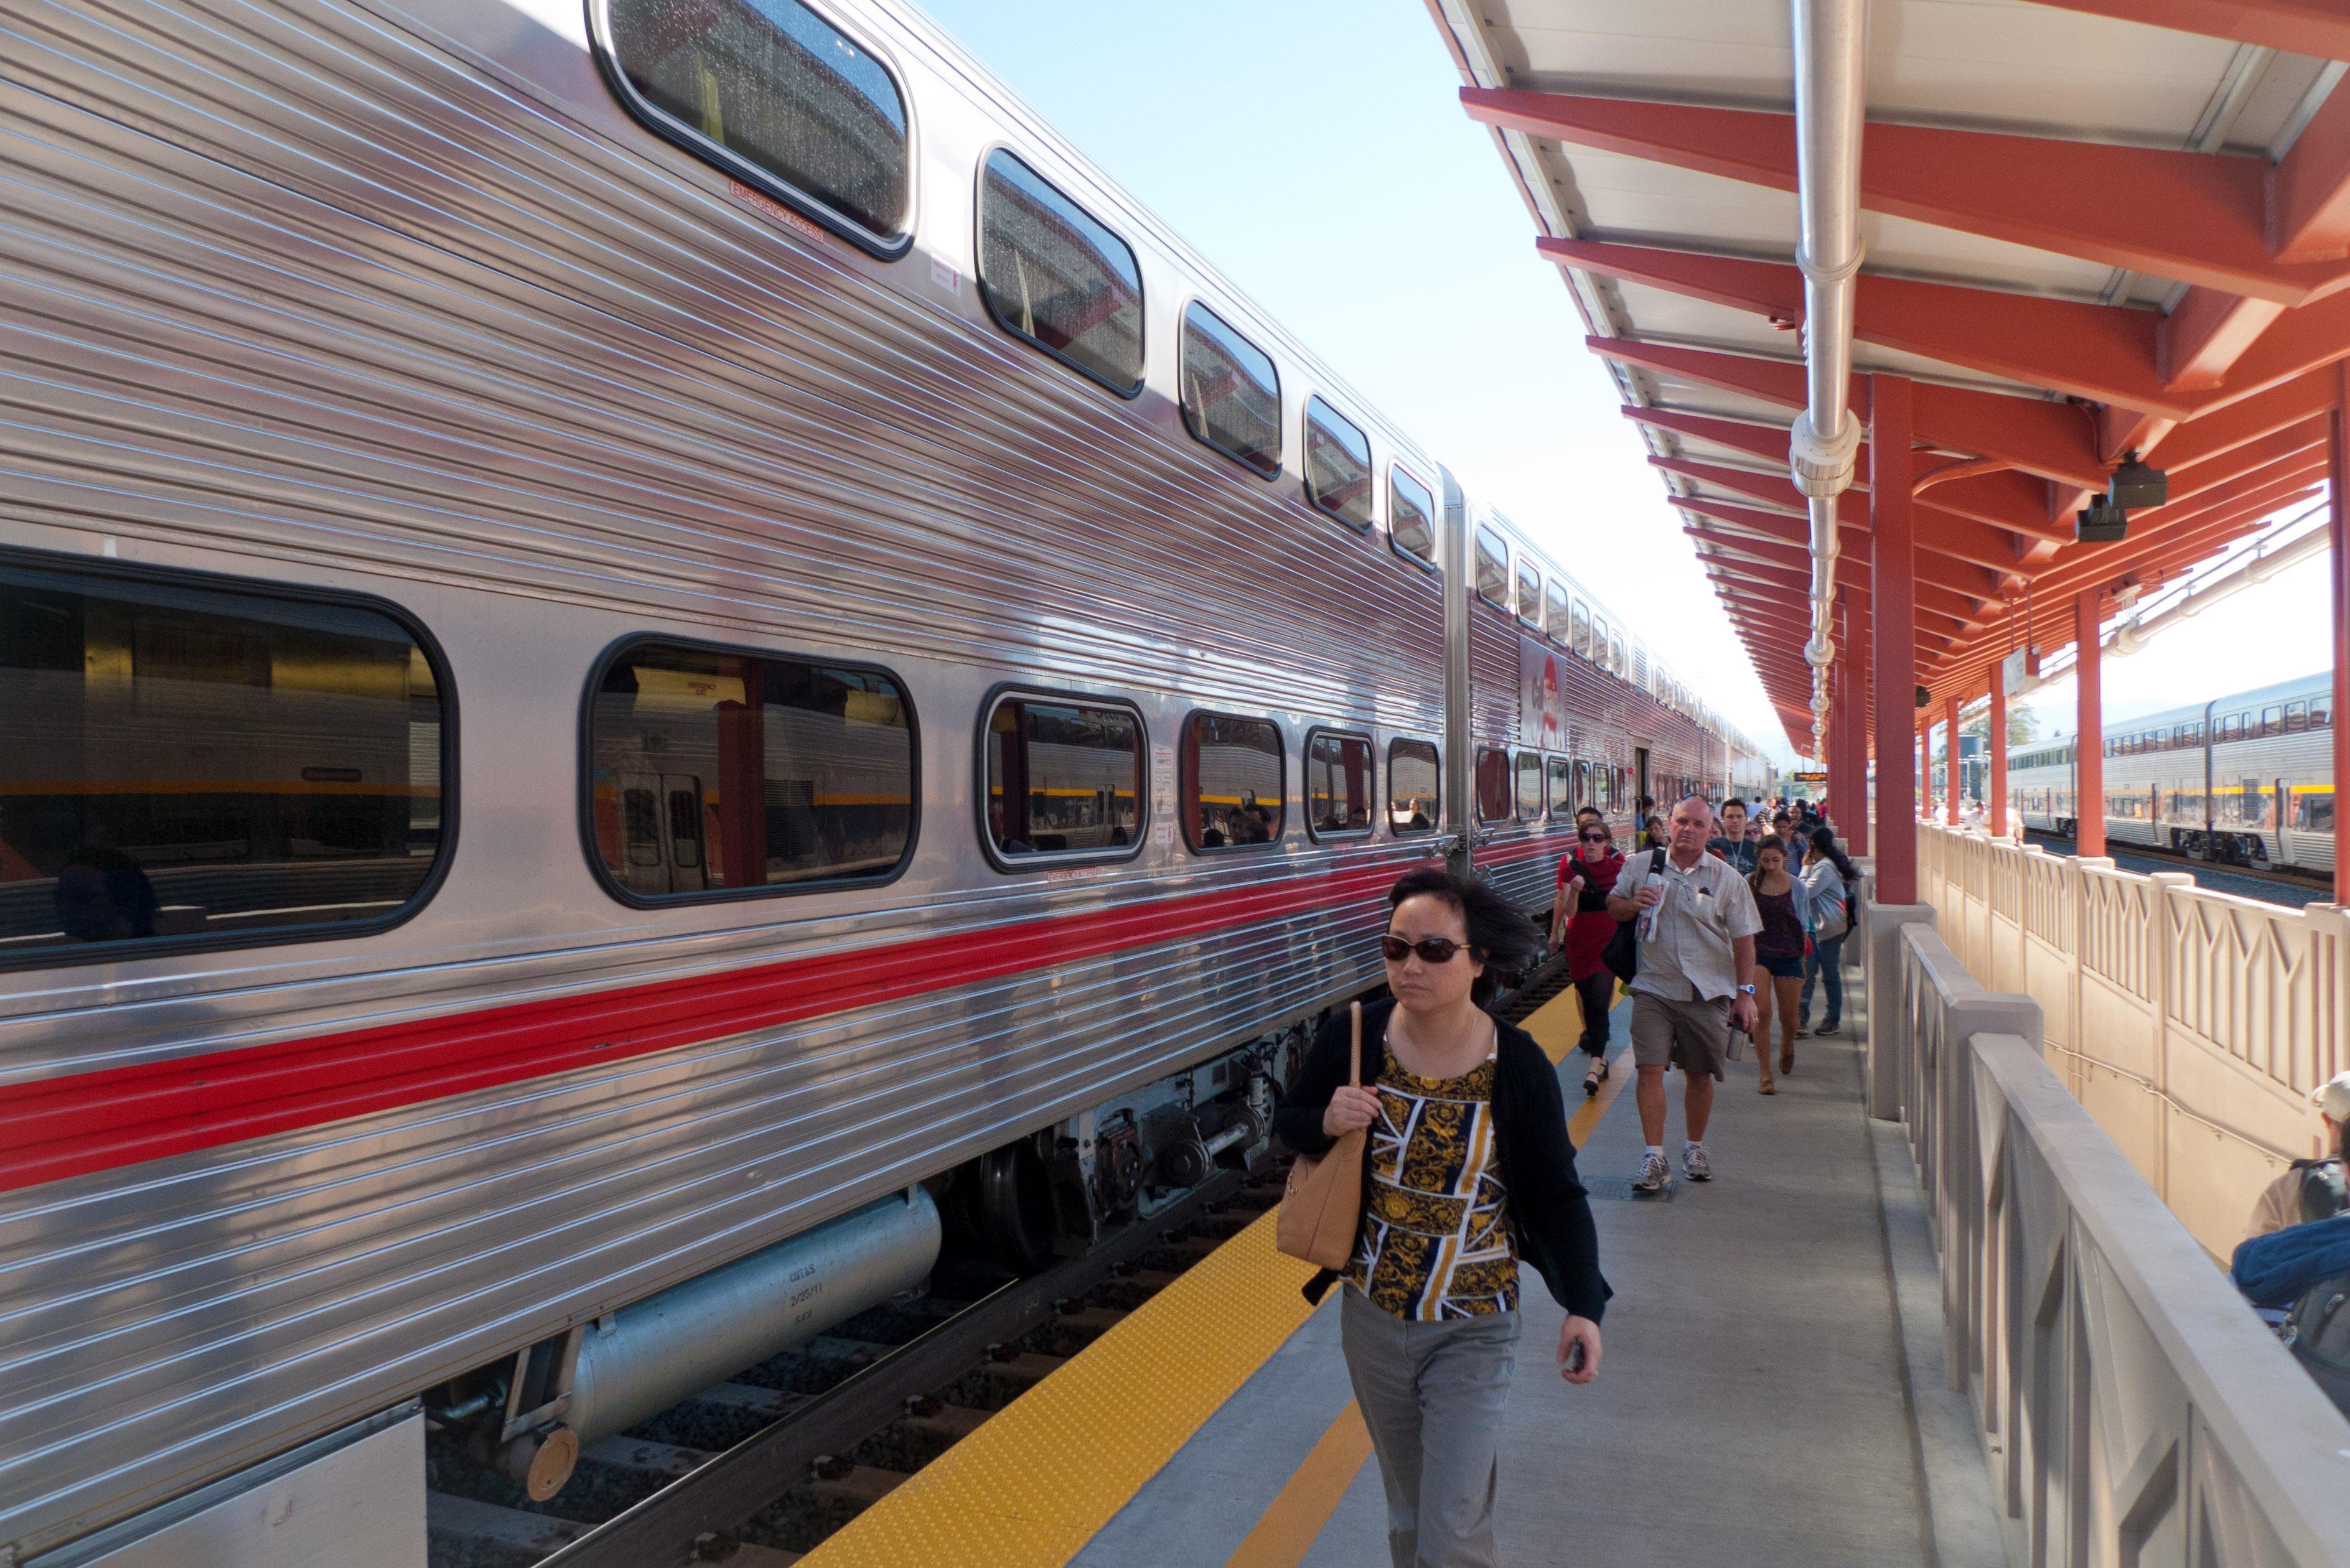 Commuter rail passengers